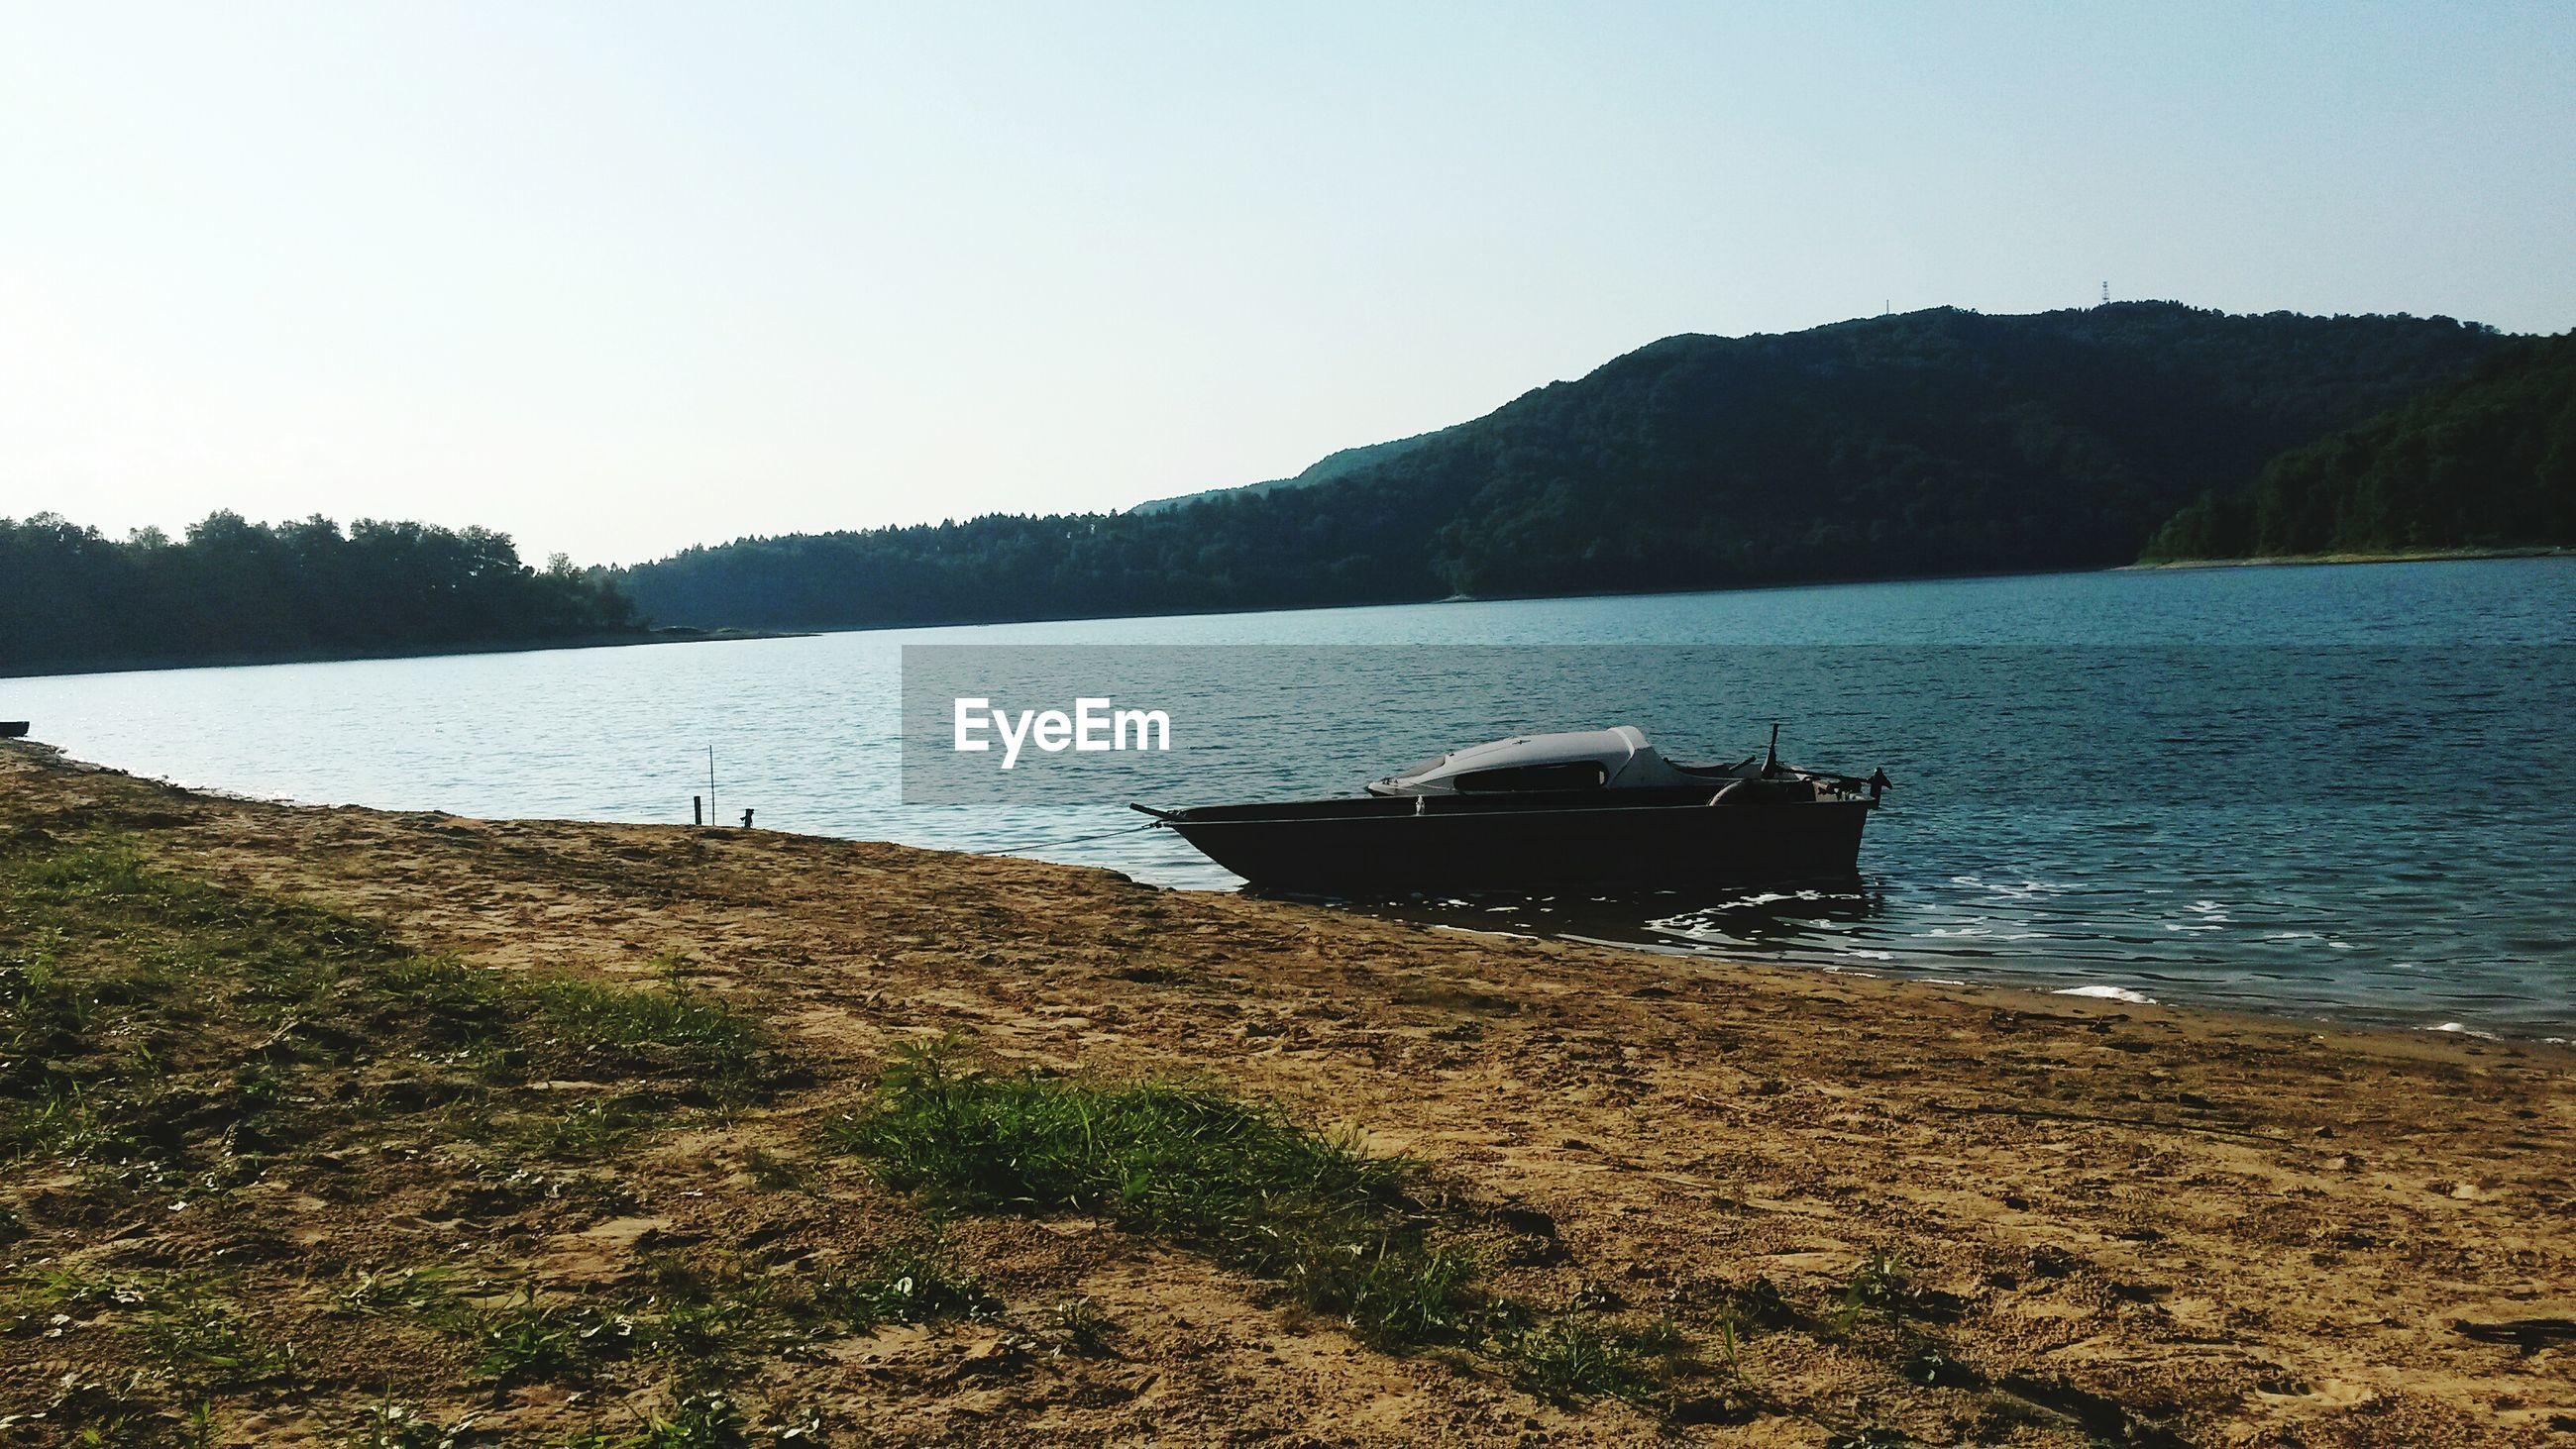 Motorboat moored at shore in lake against sky